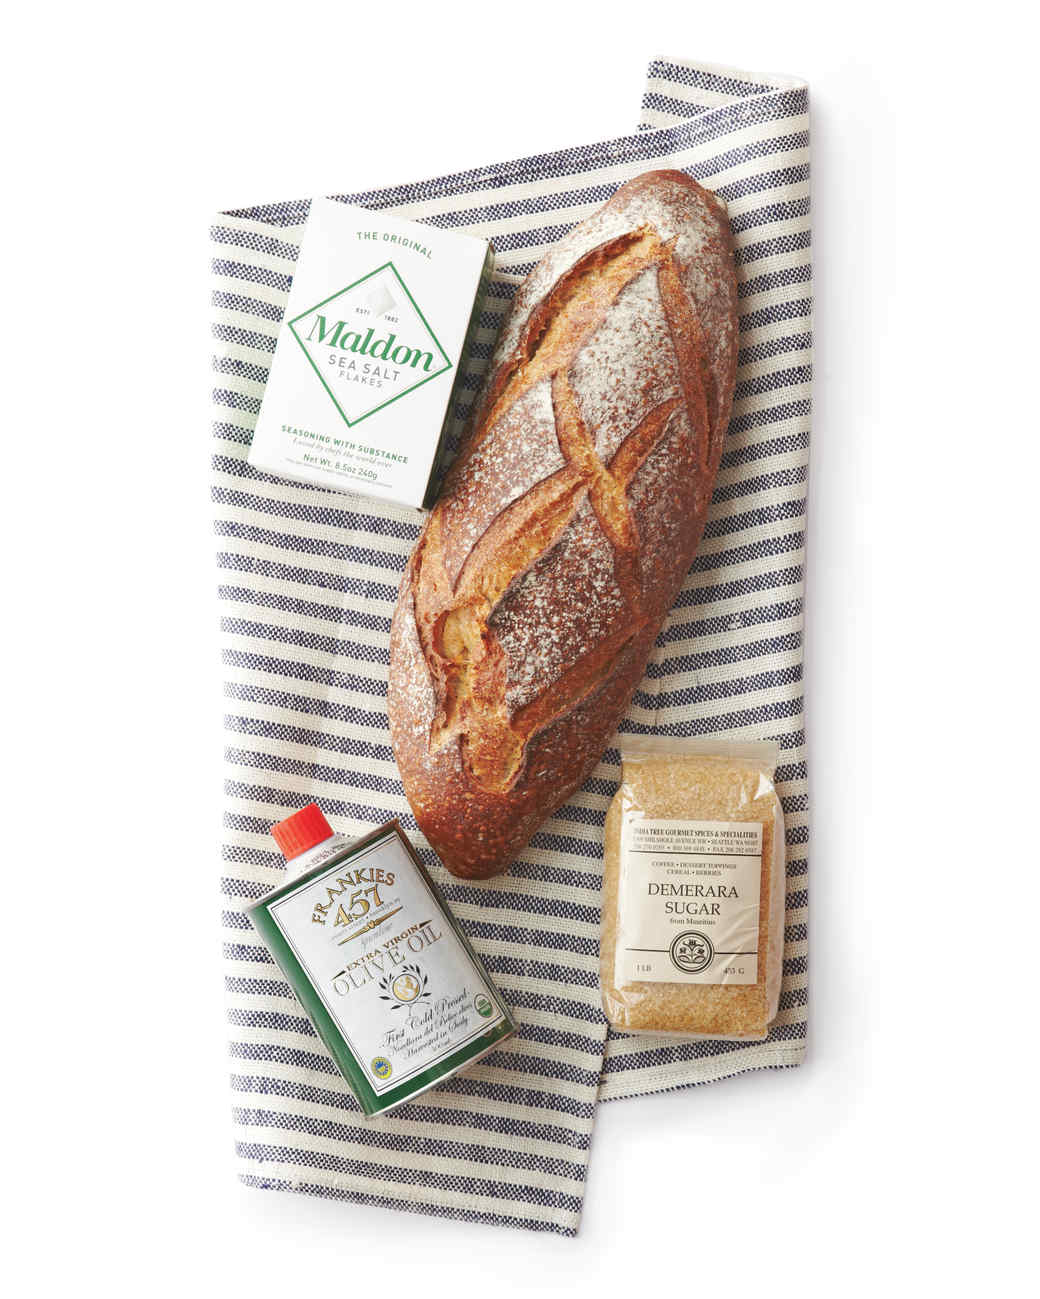 salt-bread-olive-oil-mld108797.jpg